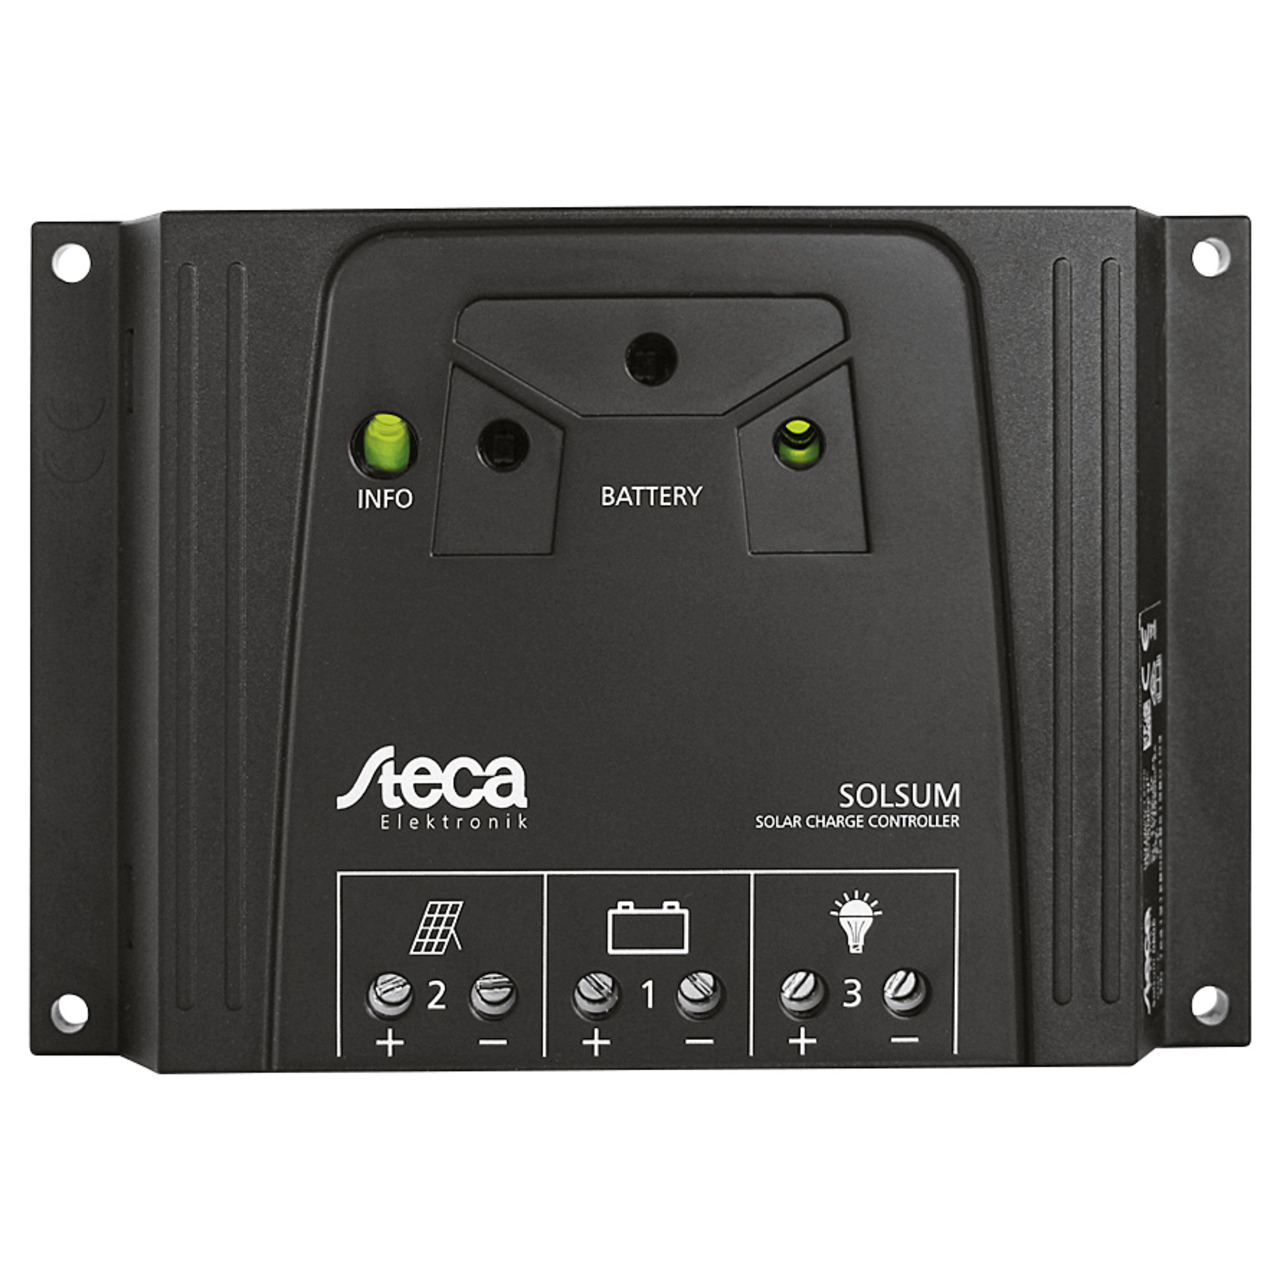 Steca Elektronik Solarladeregler 6-6F 12-24V- 6A- LED-Anzeige